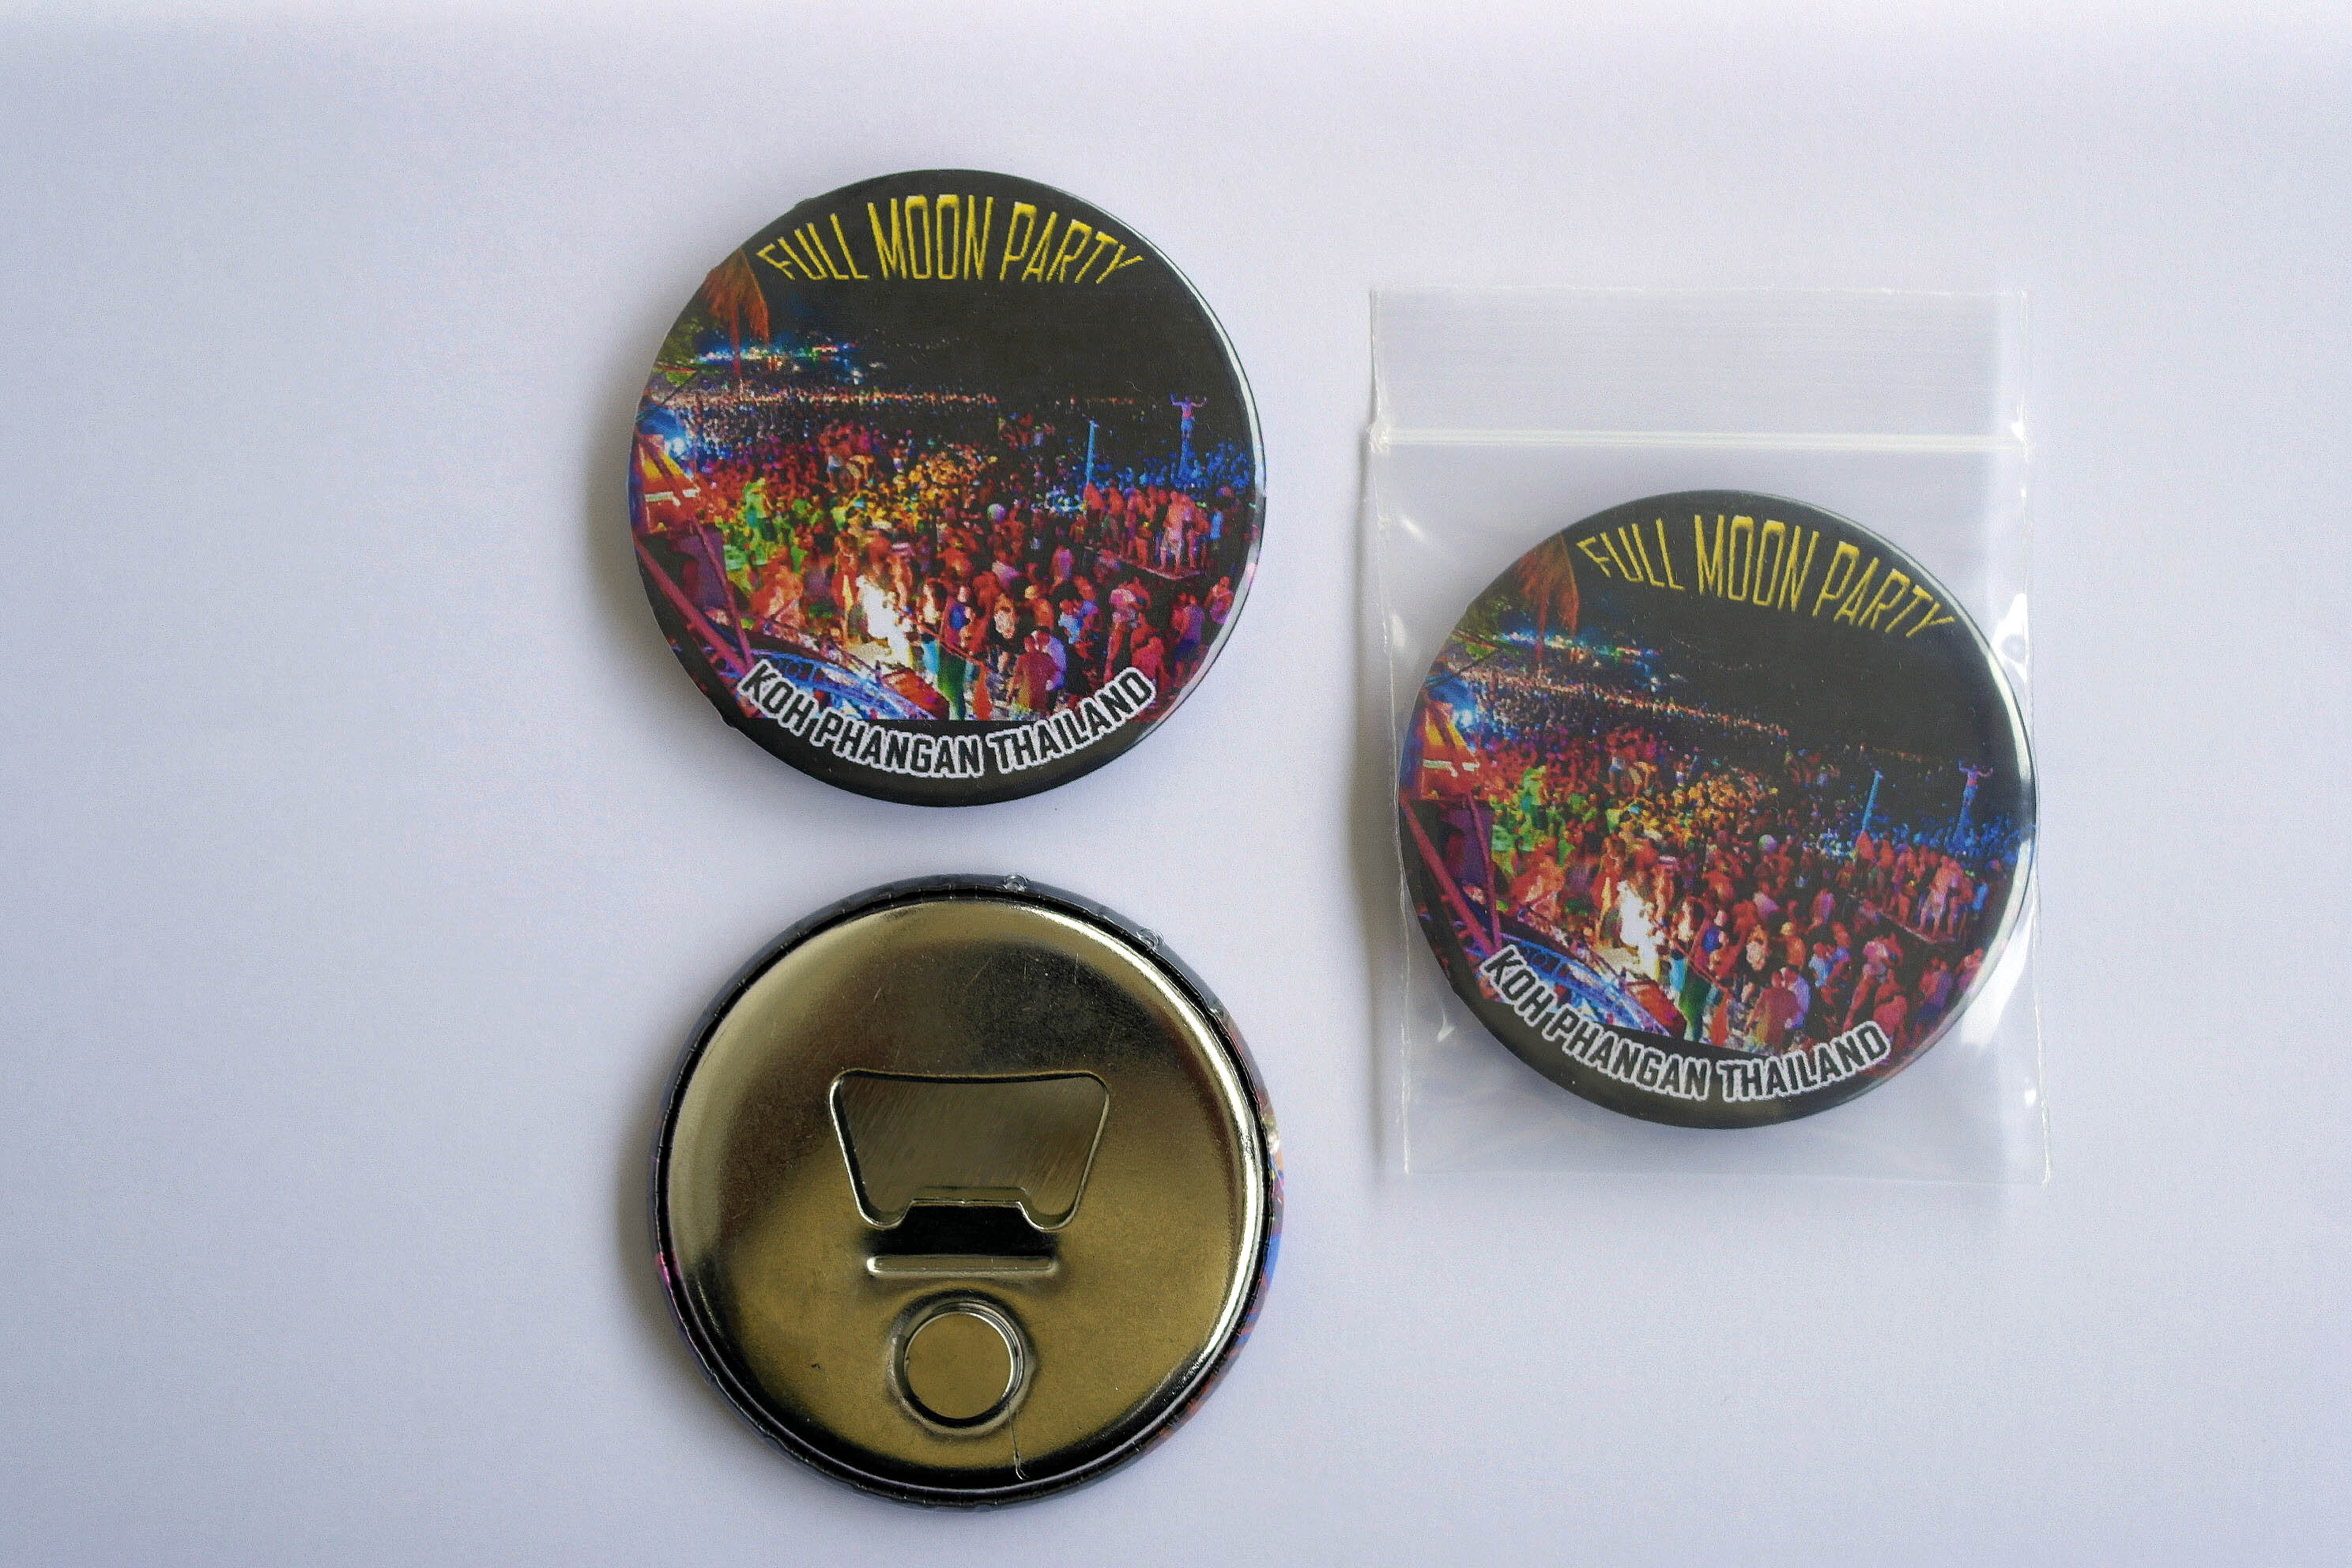 Koh Phangan Full Moon Party 58 mm Fridge Magnet